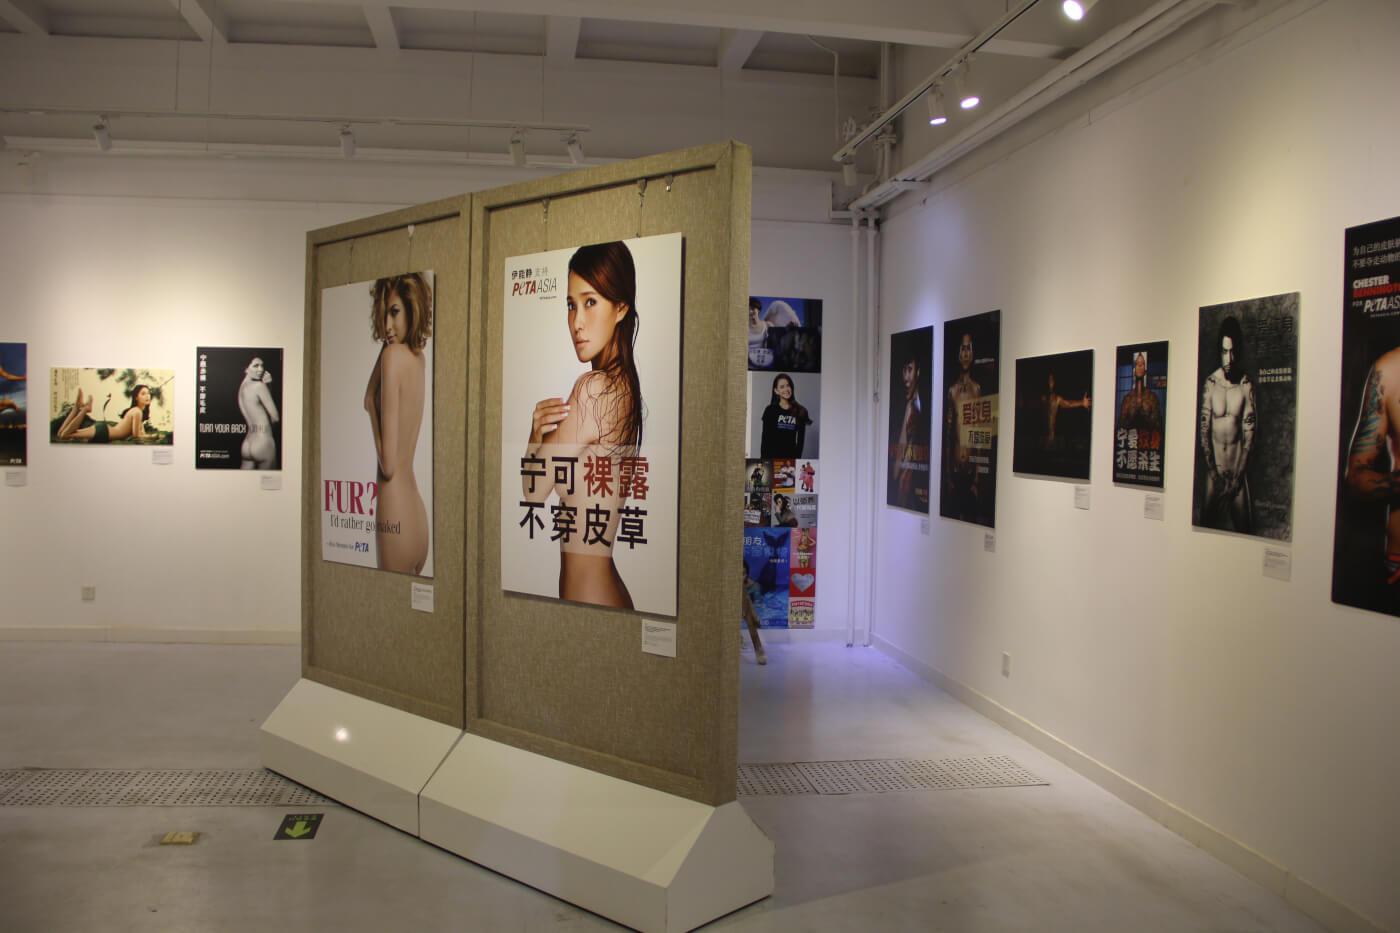 PHOTOS: PETA's Retrospective of Naked Ads for Fashion Week